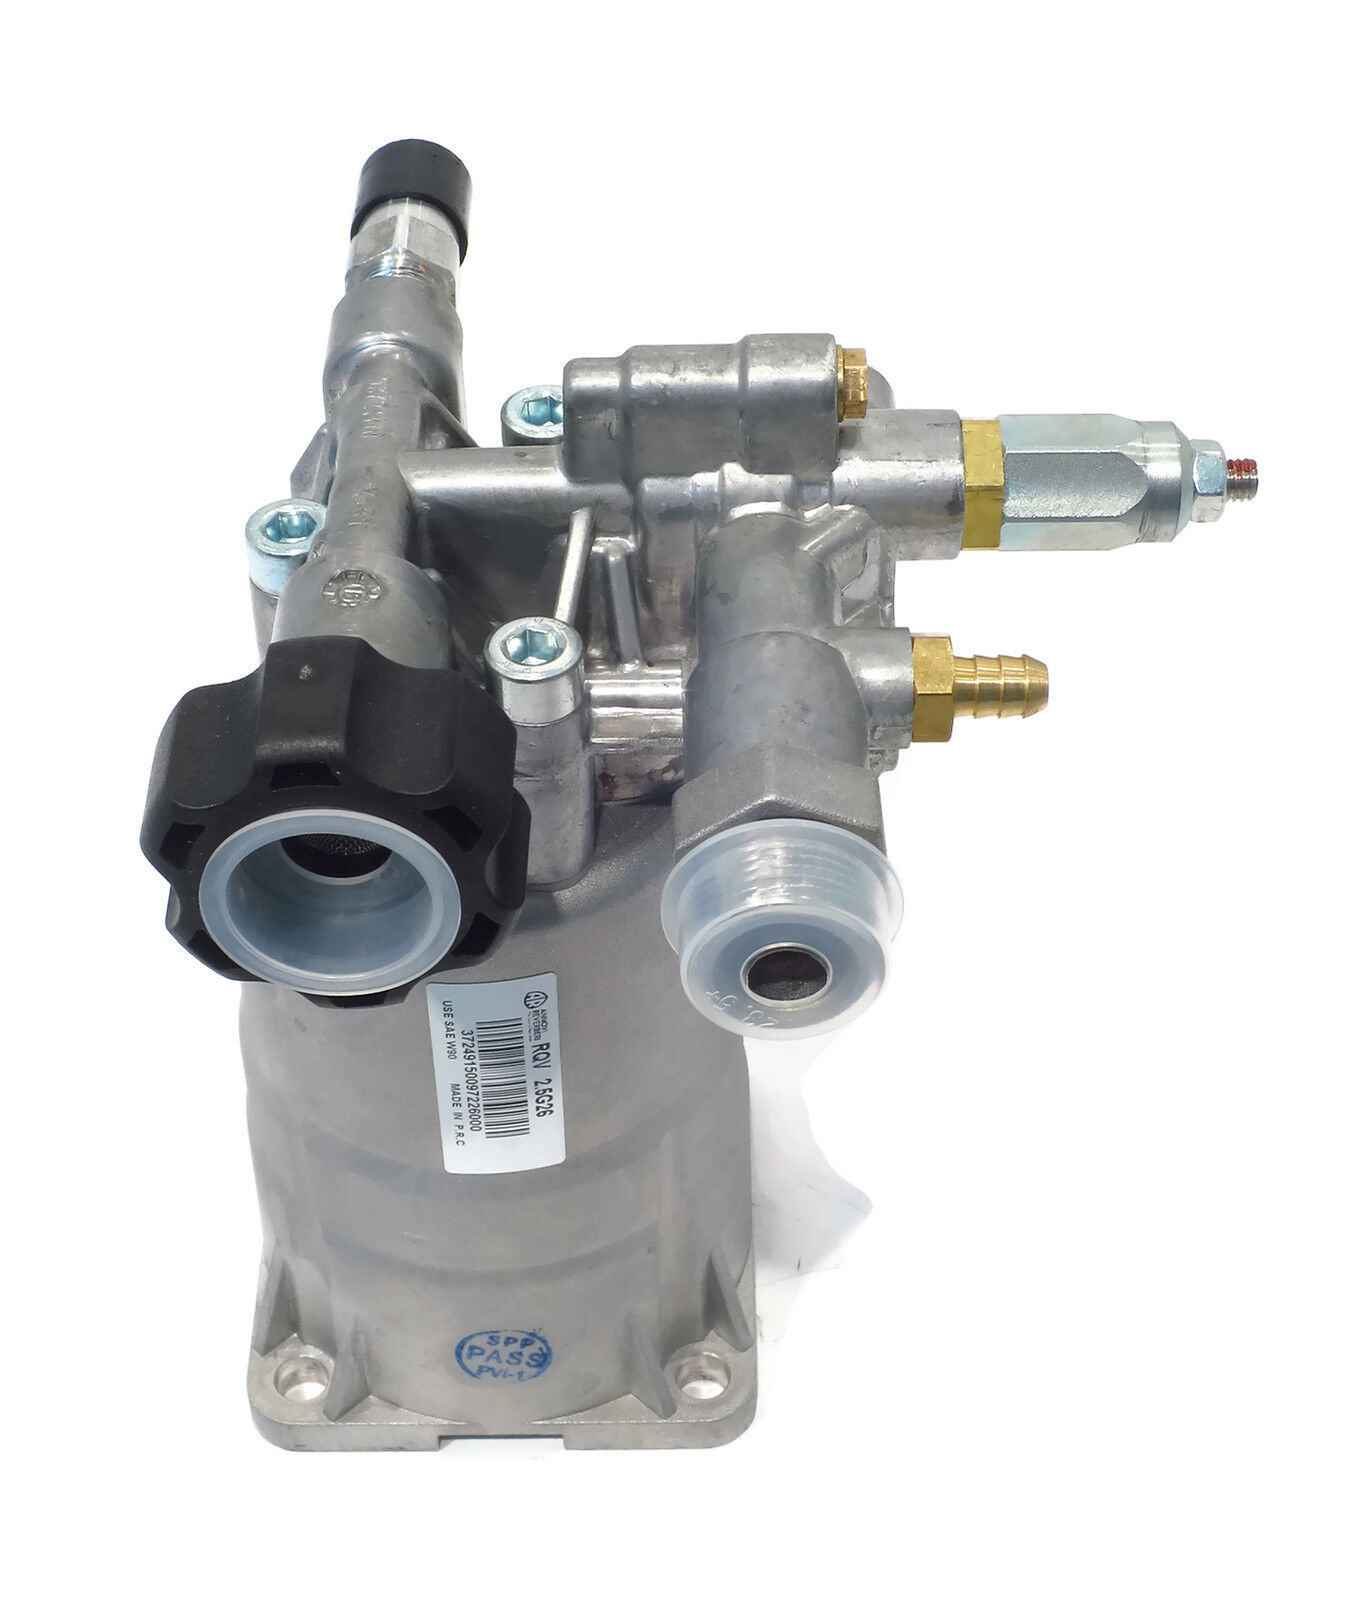 Power Pressure Washer Pump for Coleman ProForce PW0102350 /& PW0102350.03 Sprayer